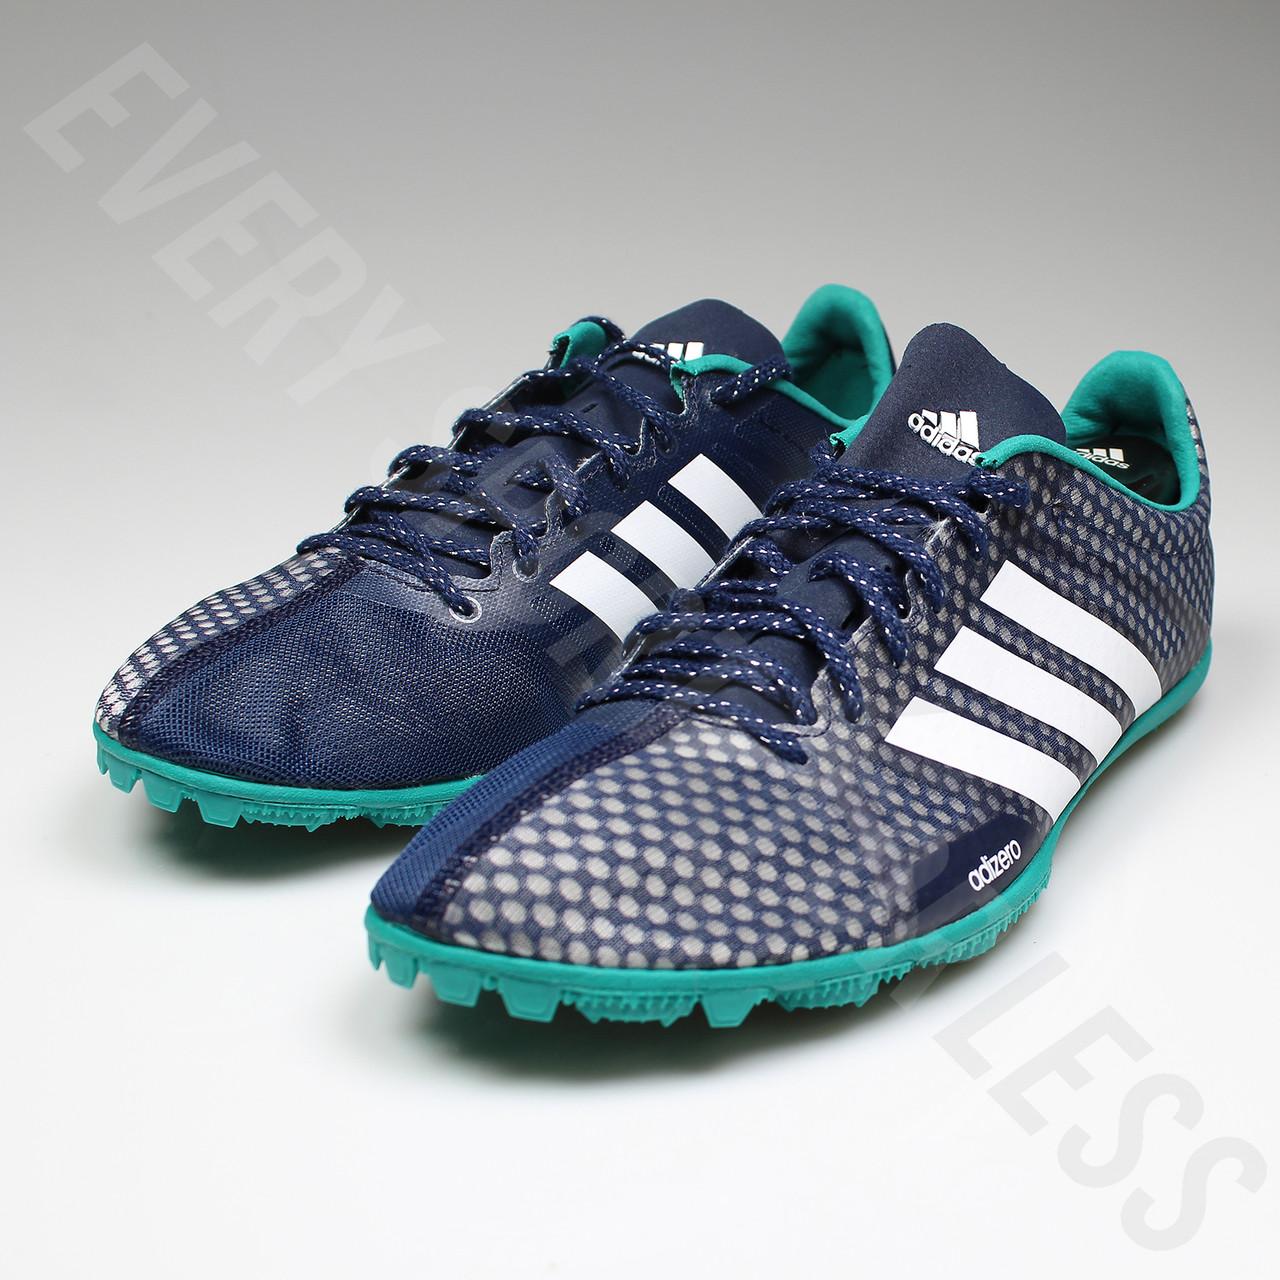 the latest 1434d 4c58b ... Adidas Adizero Ambition 3 Men s Track Running Spikes AQ5592 ...